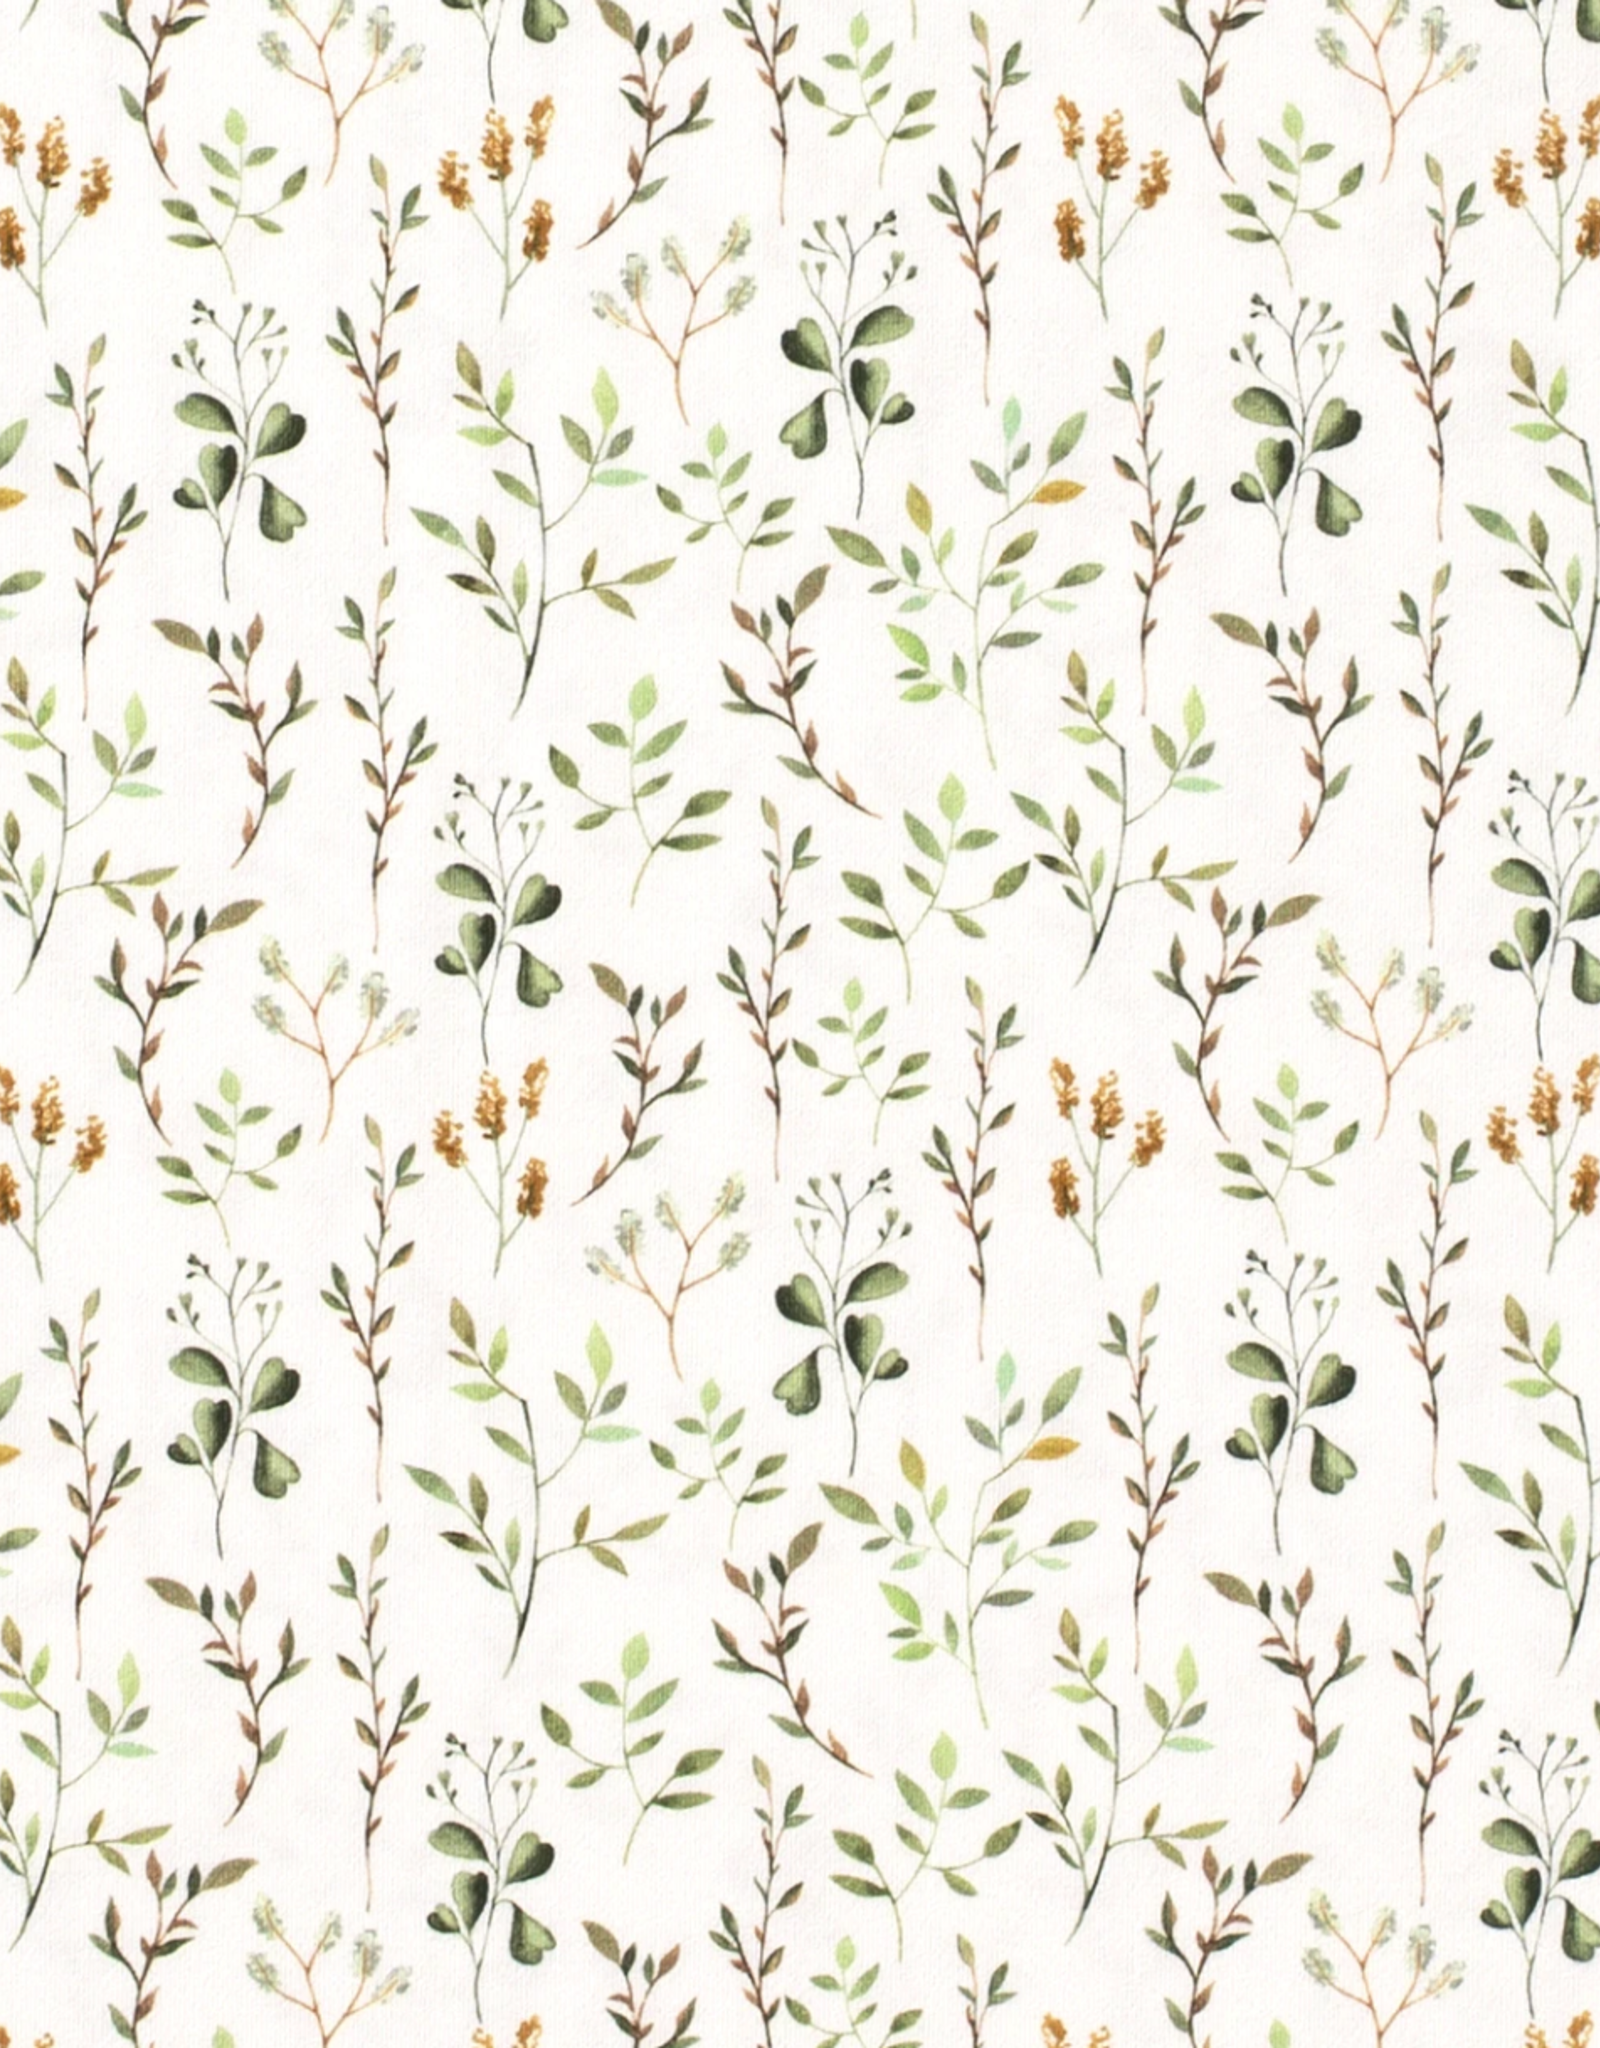 Tricot - Green Twigs